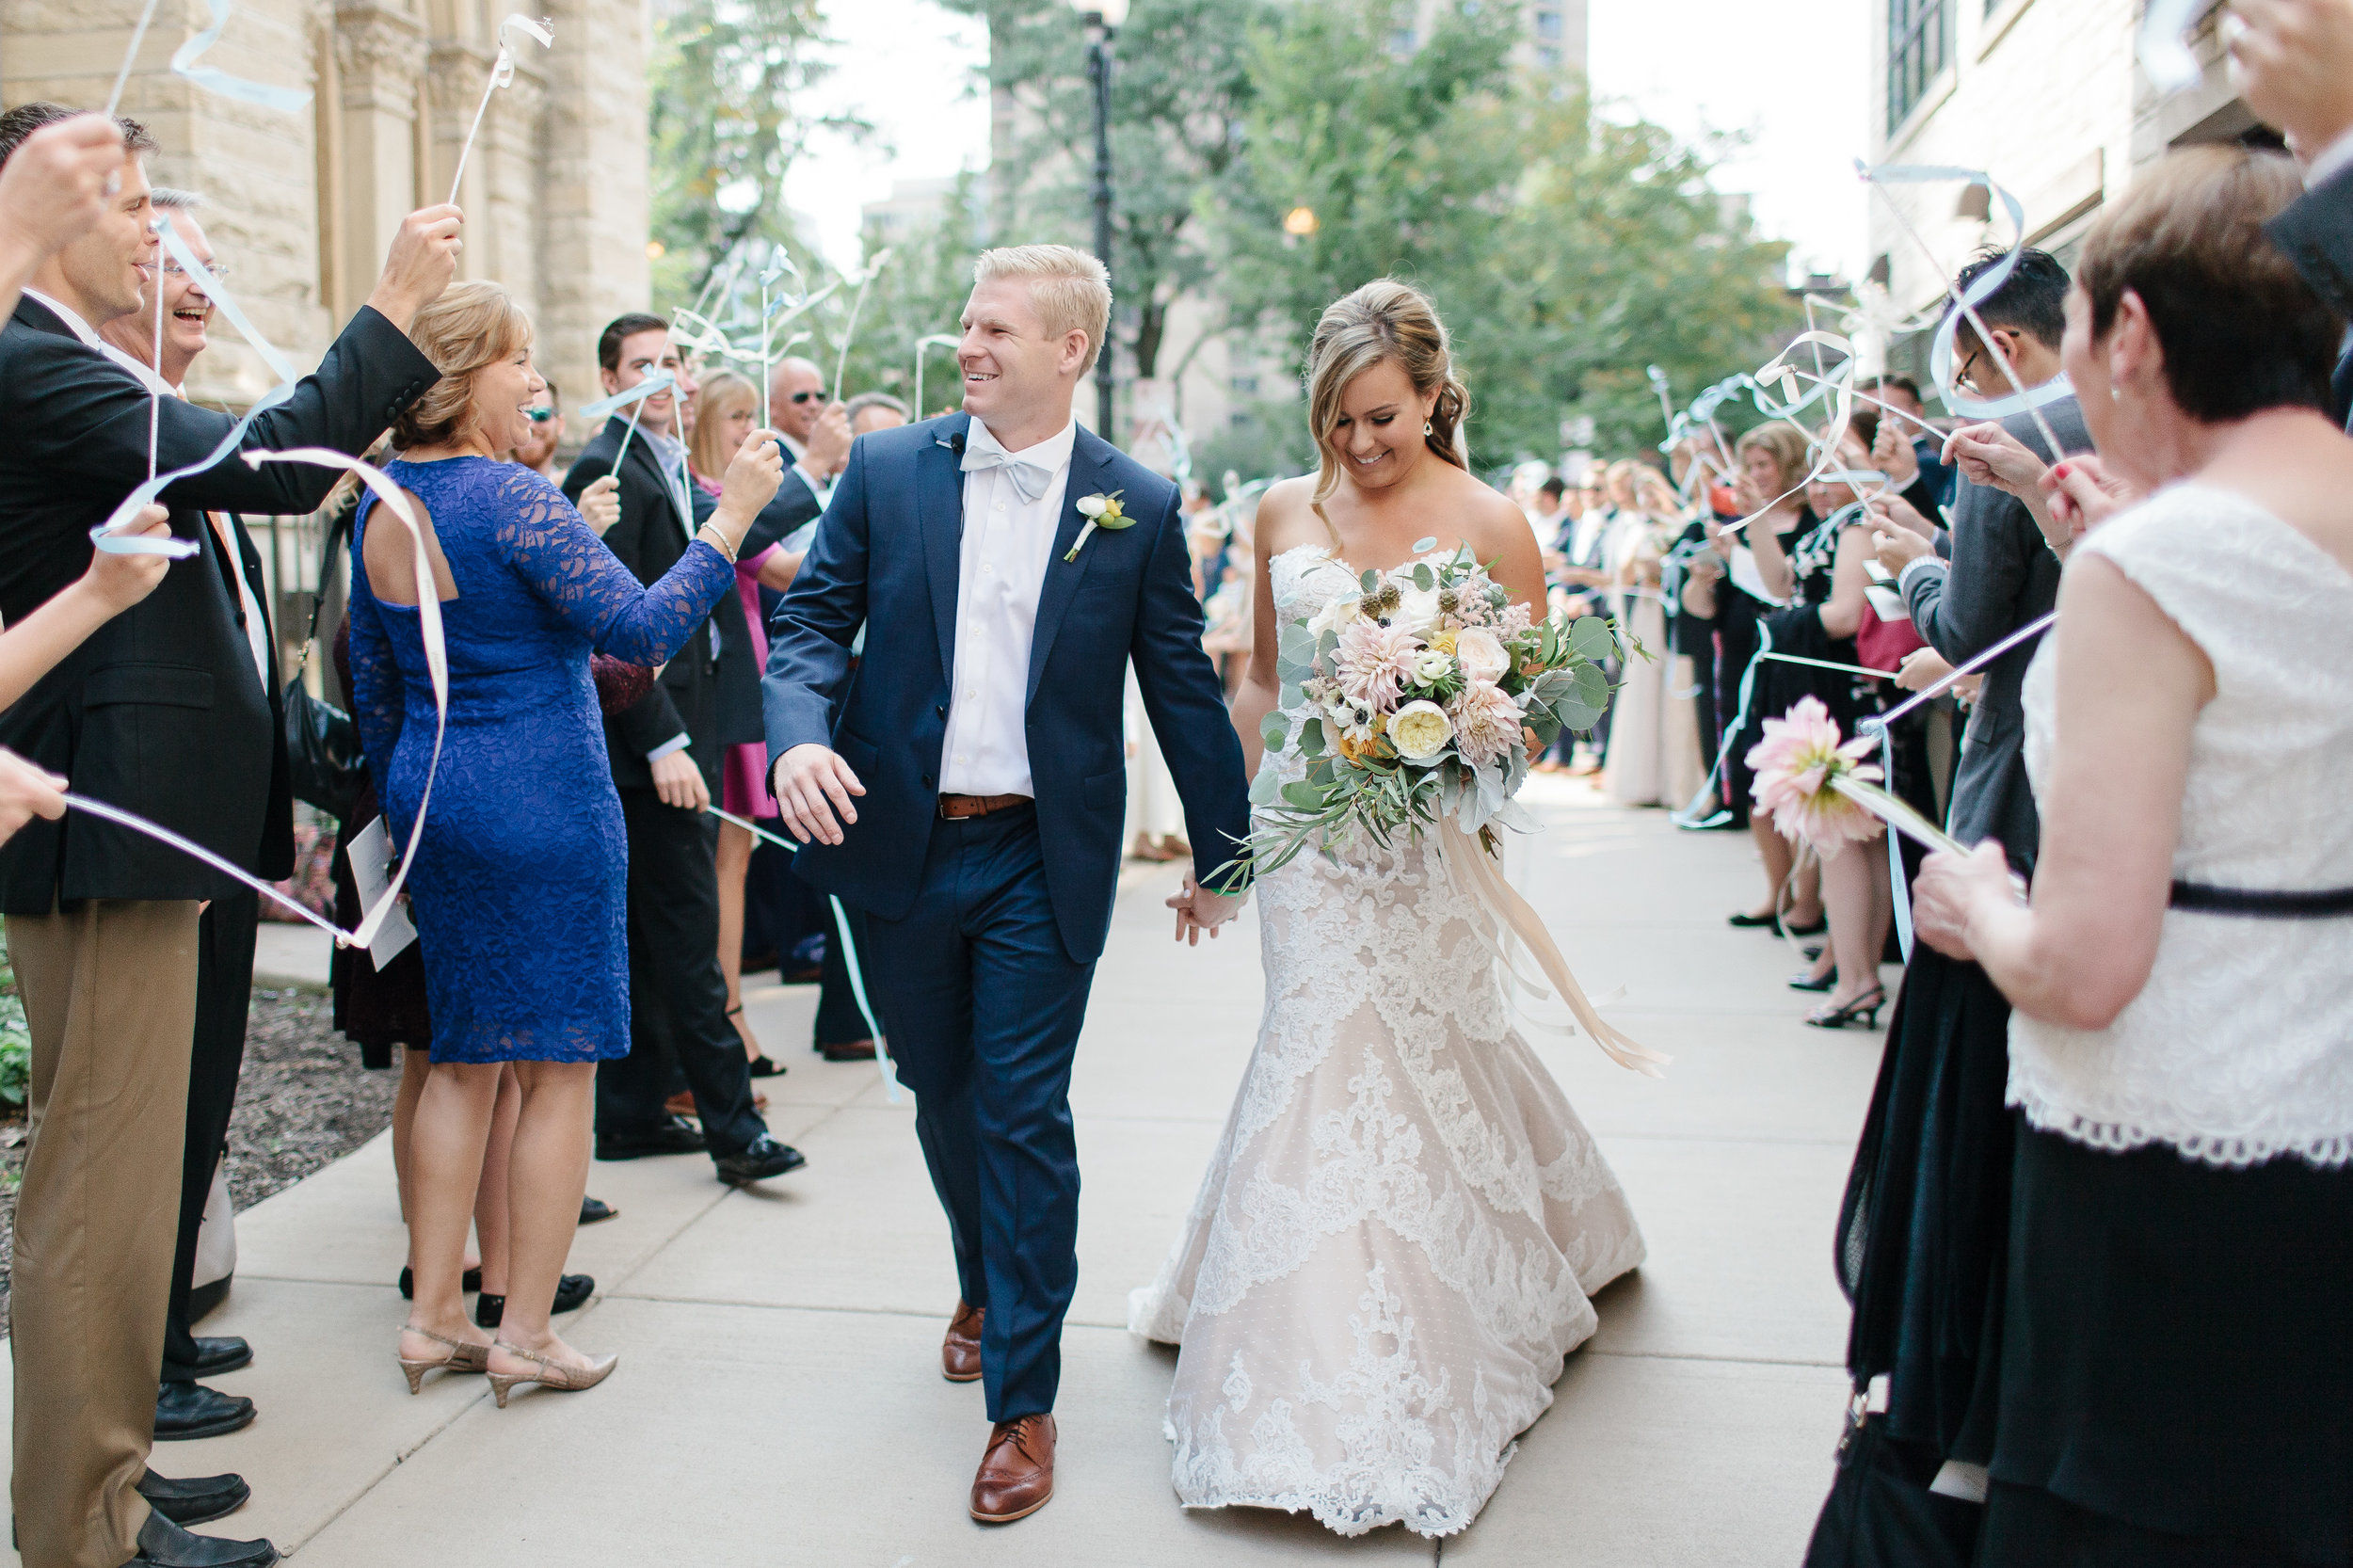 Nicodem Creative-McHugh Wedding-Artifact Events Chicago-11.jpg